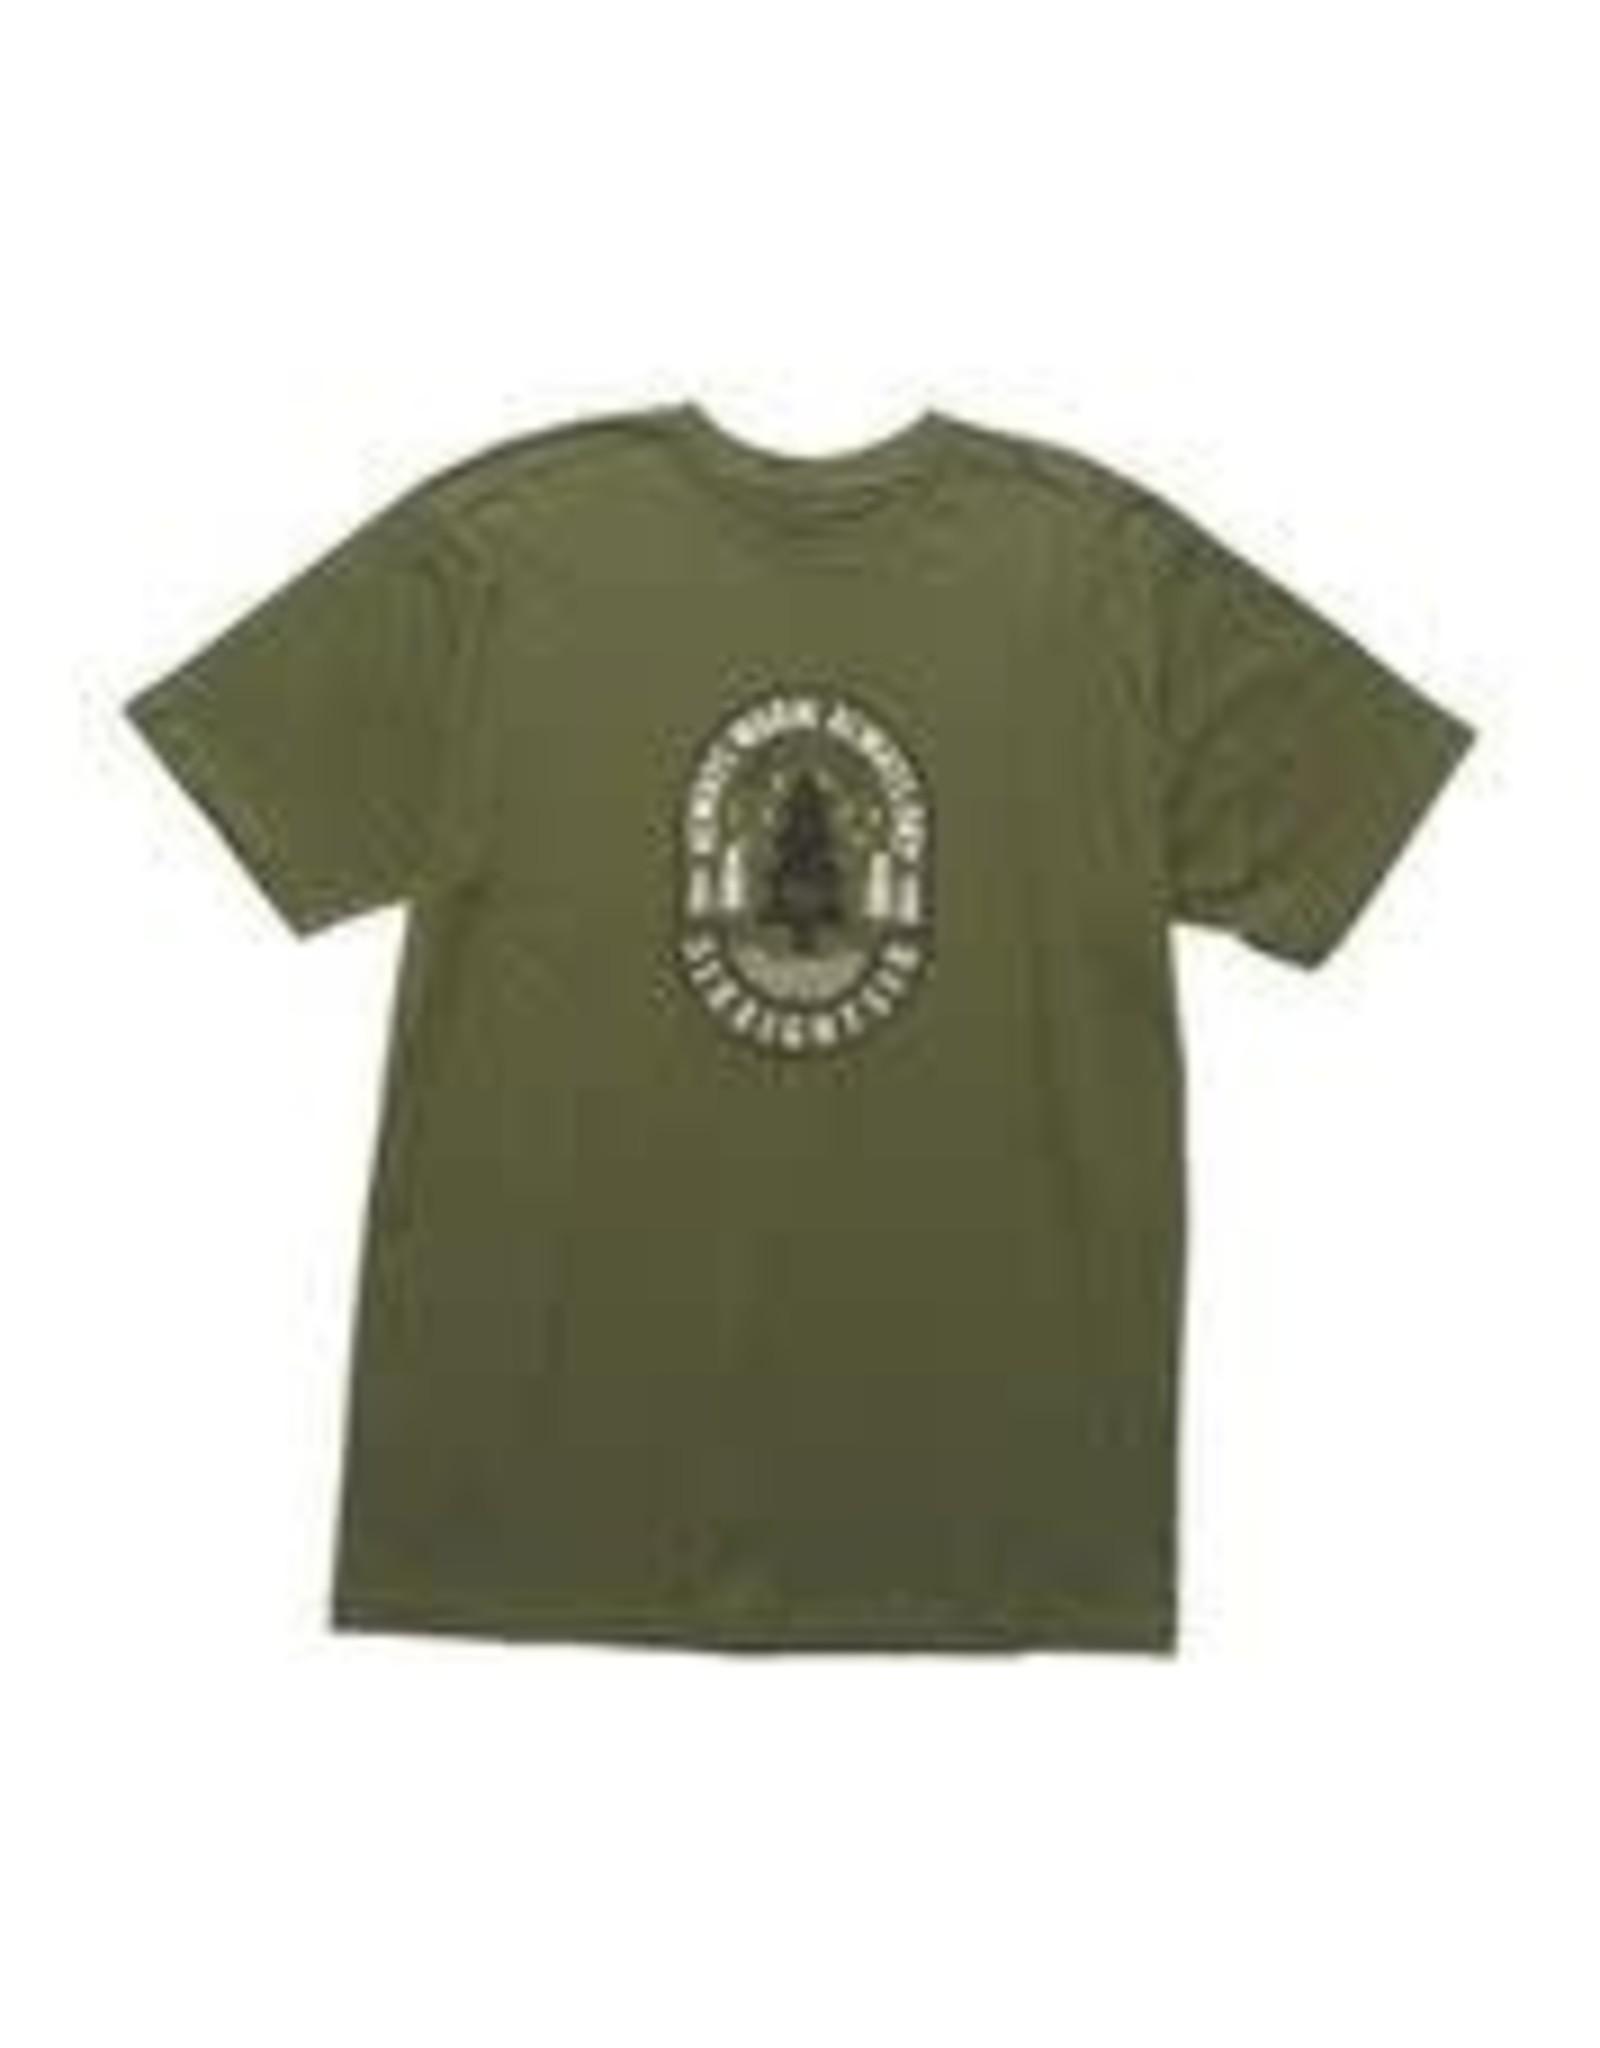 686 686 - T- shirt homme pine surplus green